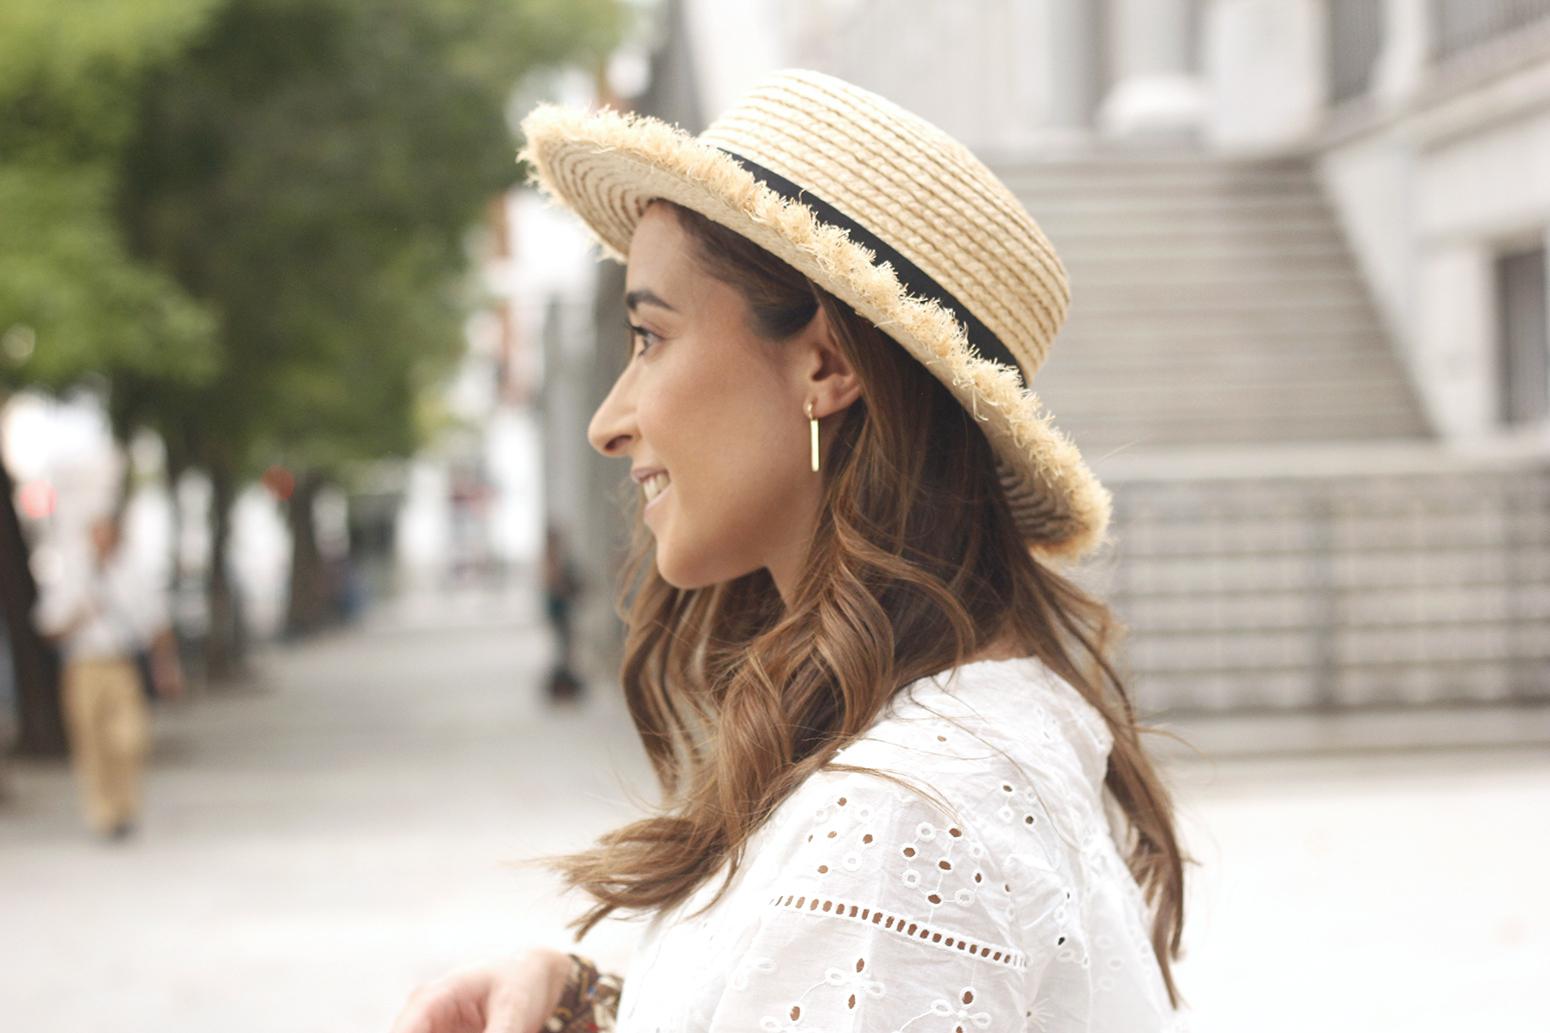 Golden Earrings accessories trend summer 20191